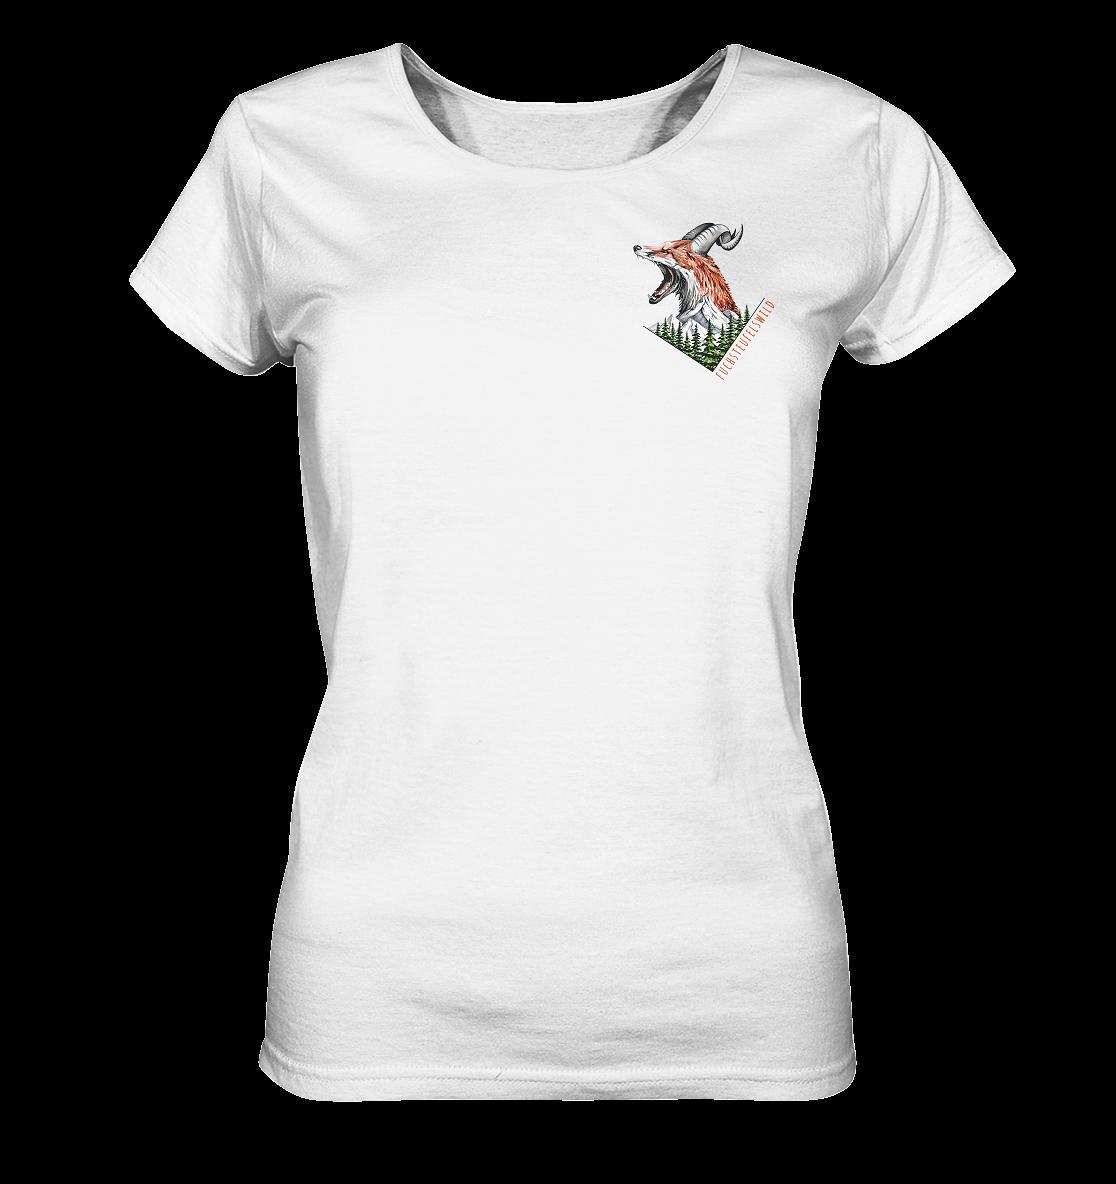 front-ladies-organic-shirt-f8f8f8-1116x-2.png